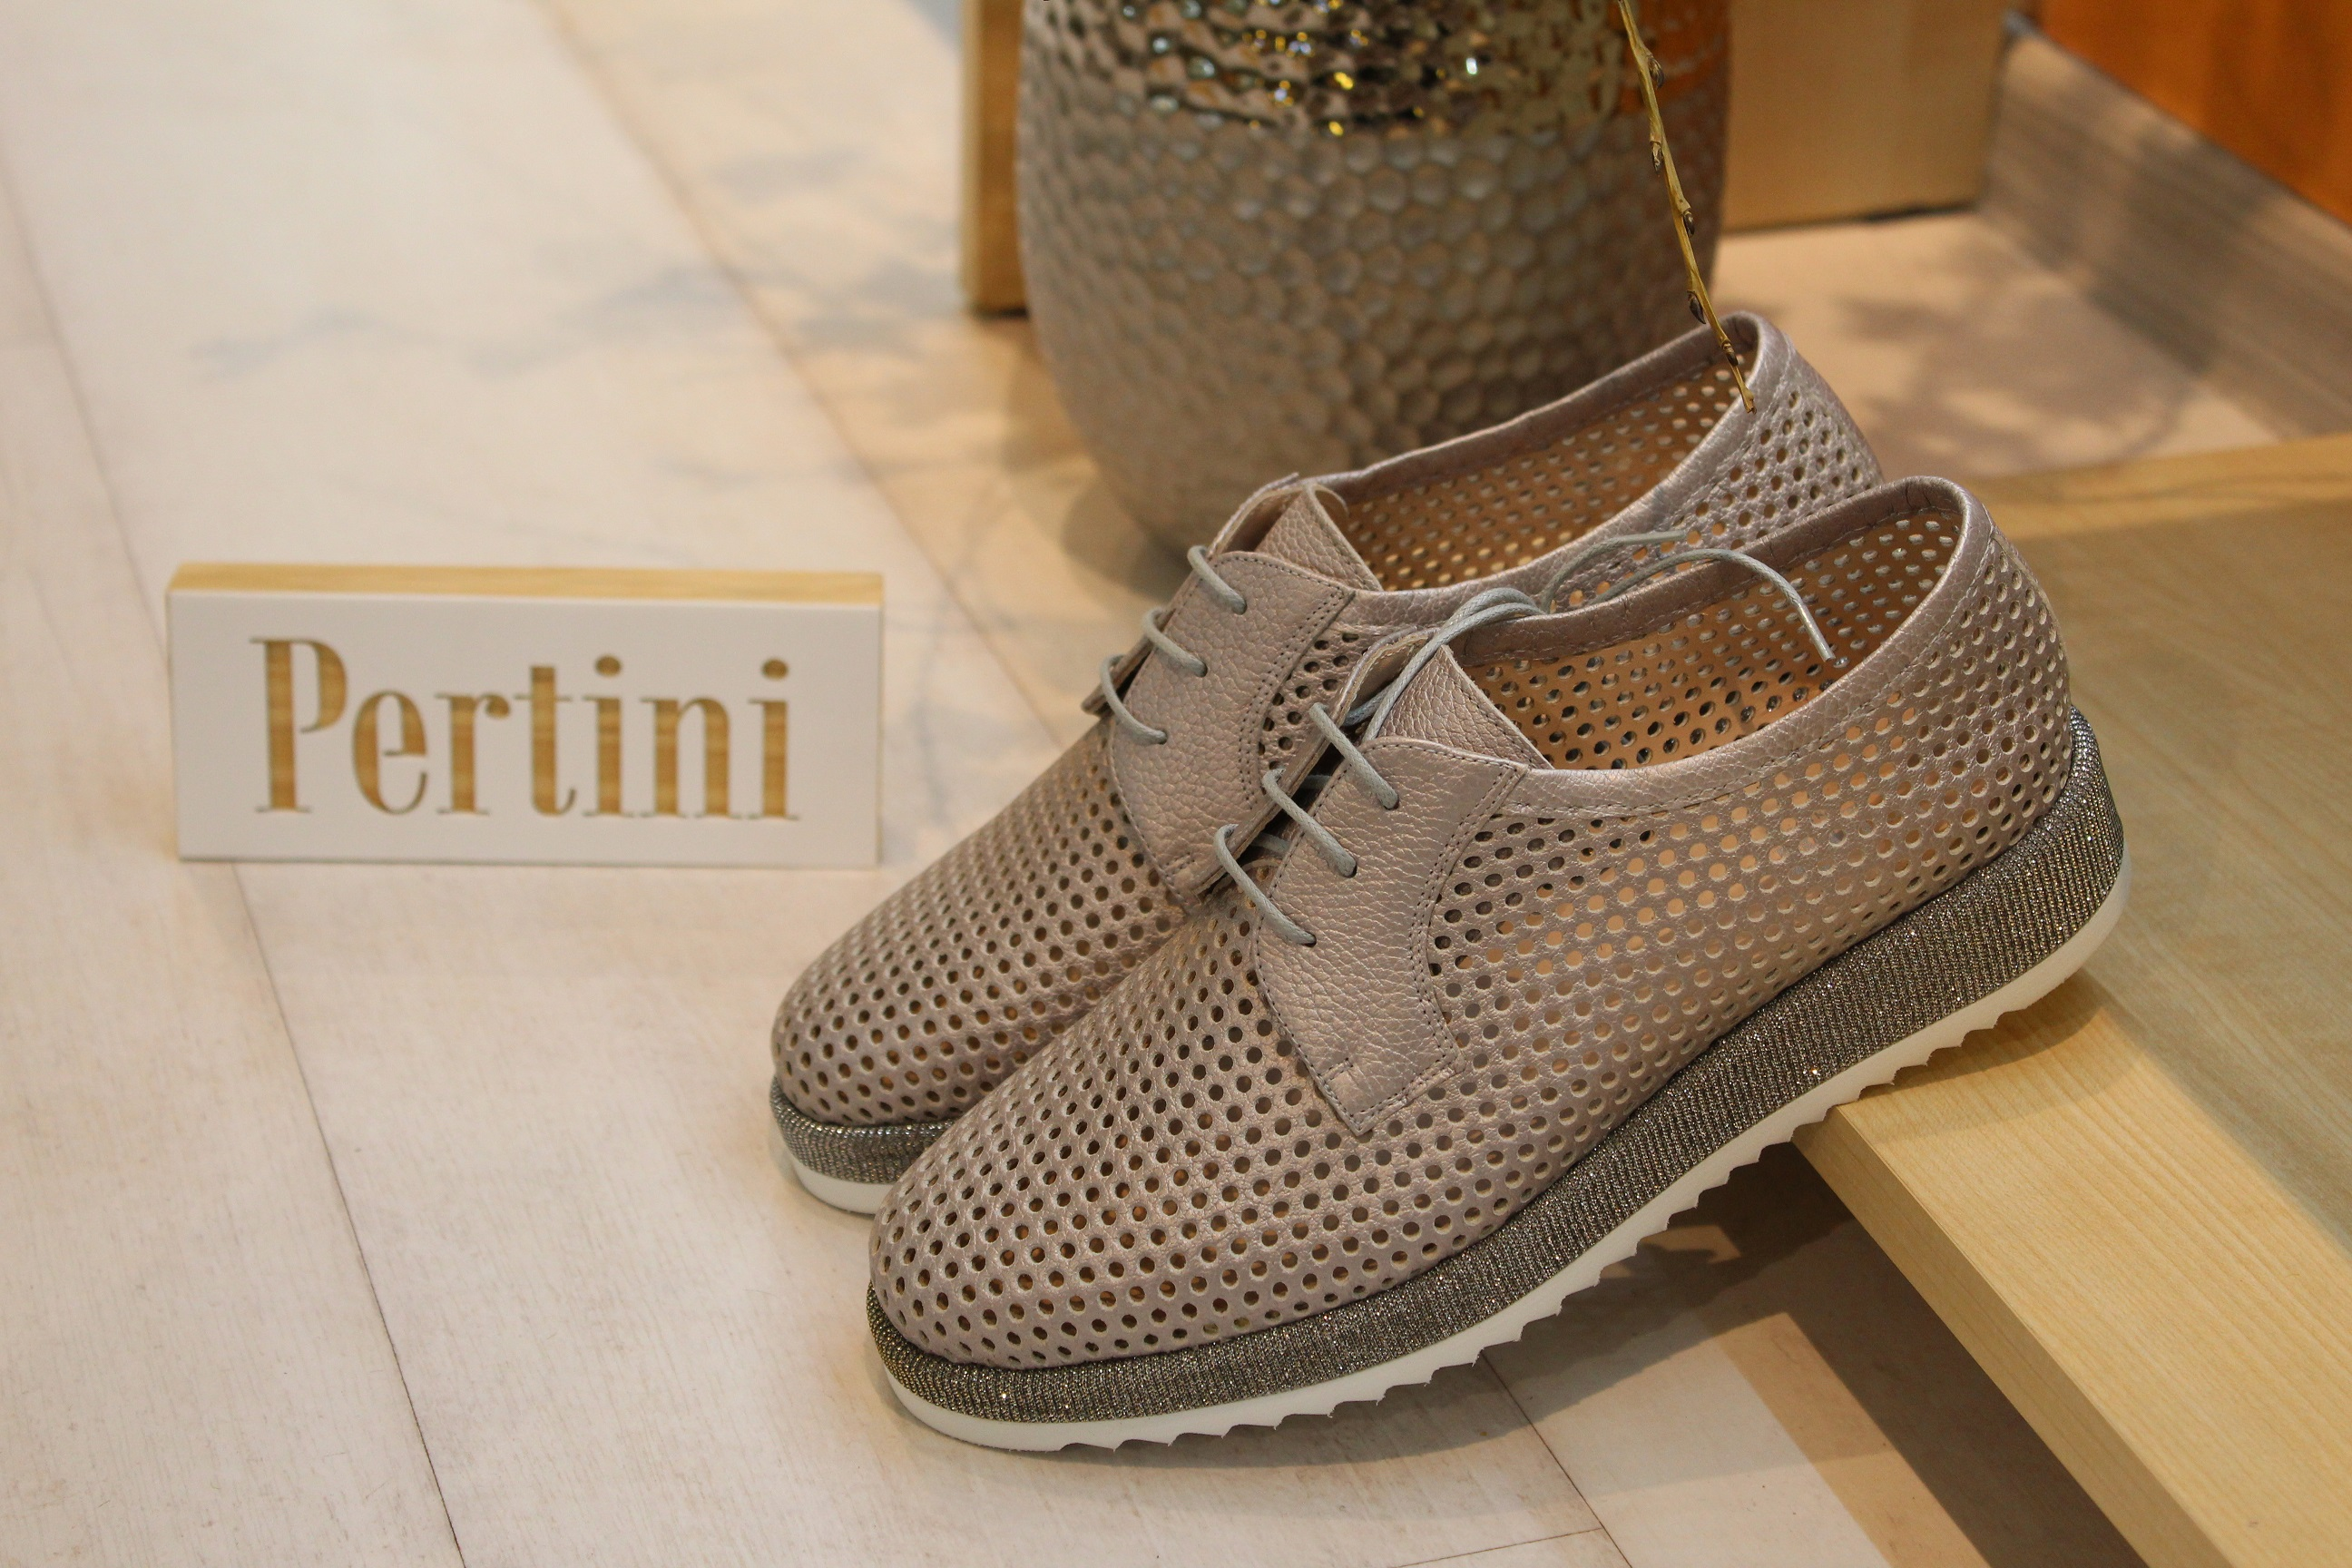 gallery_1_novaja-kollekcija-ispanskoj-obuvi-pertini-7